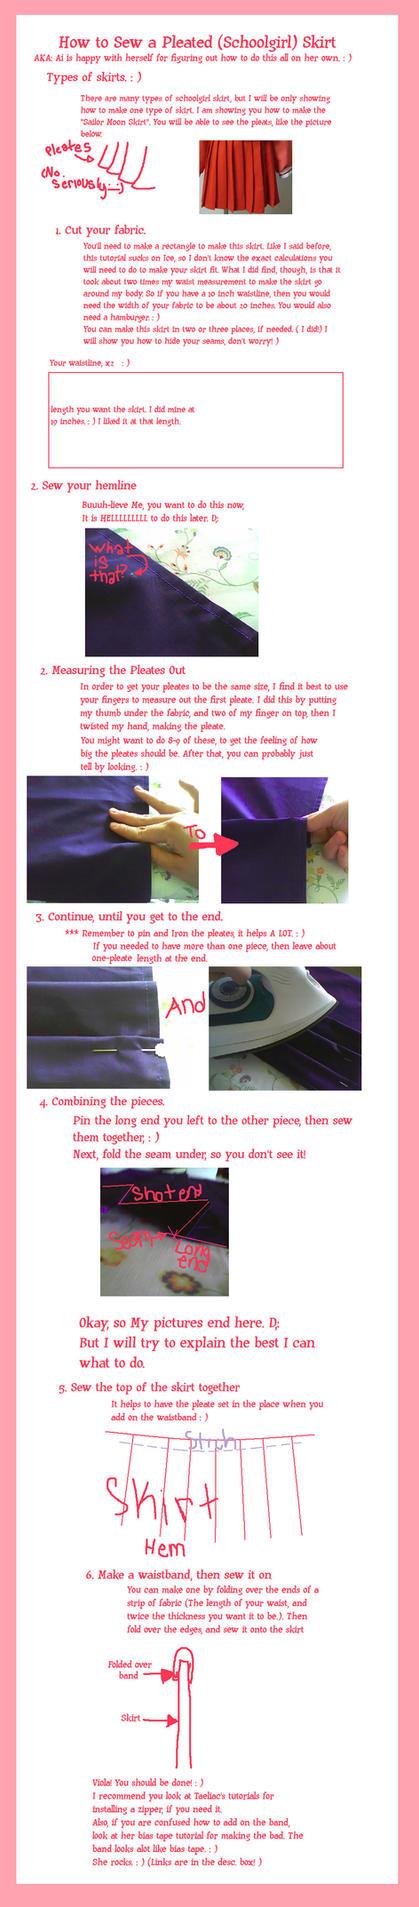 Pleated Skirt Tutorial by Aidotcom